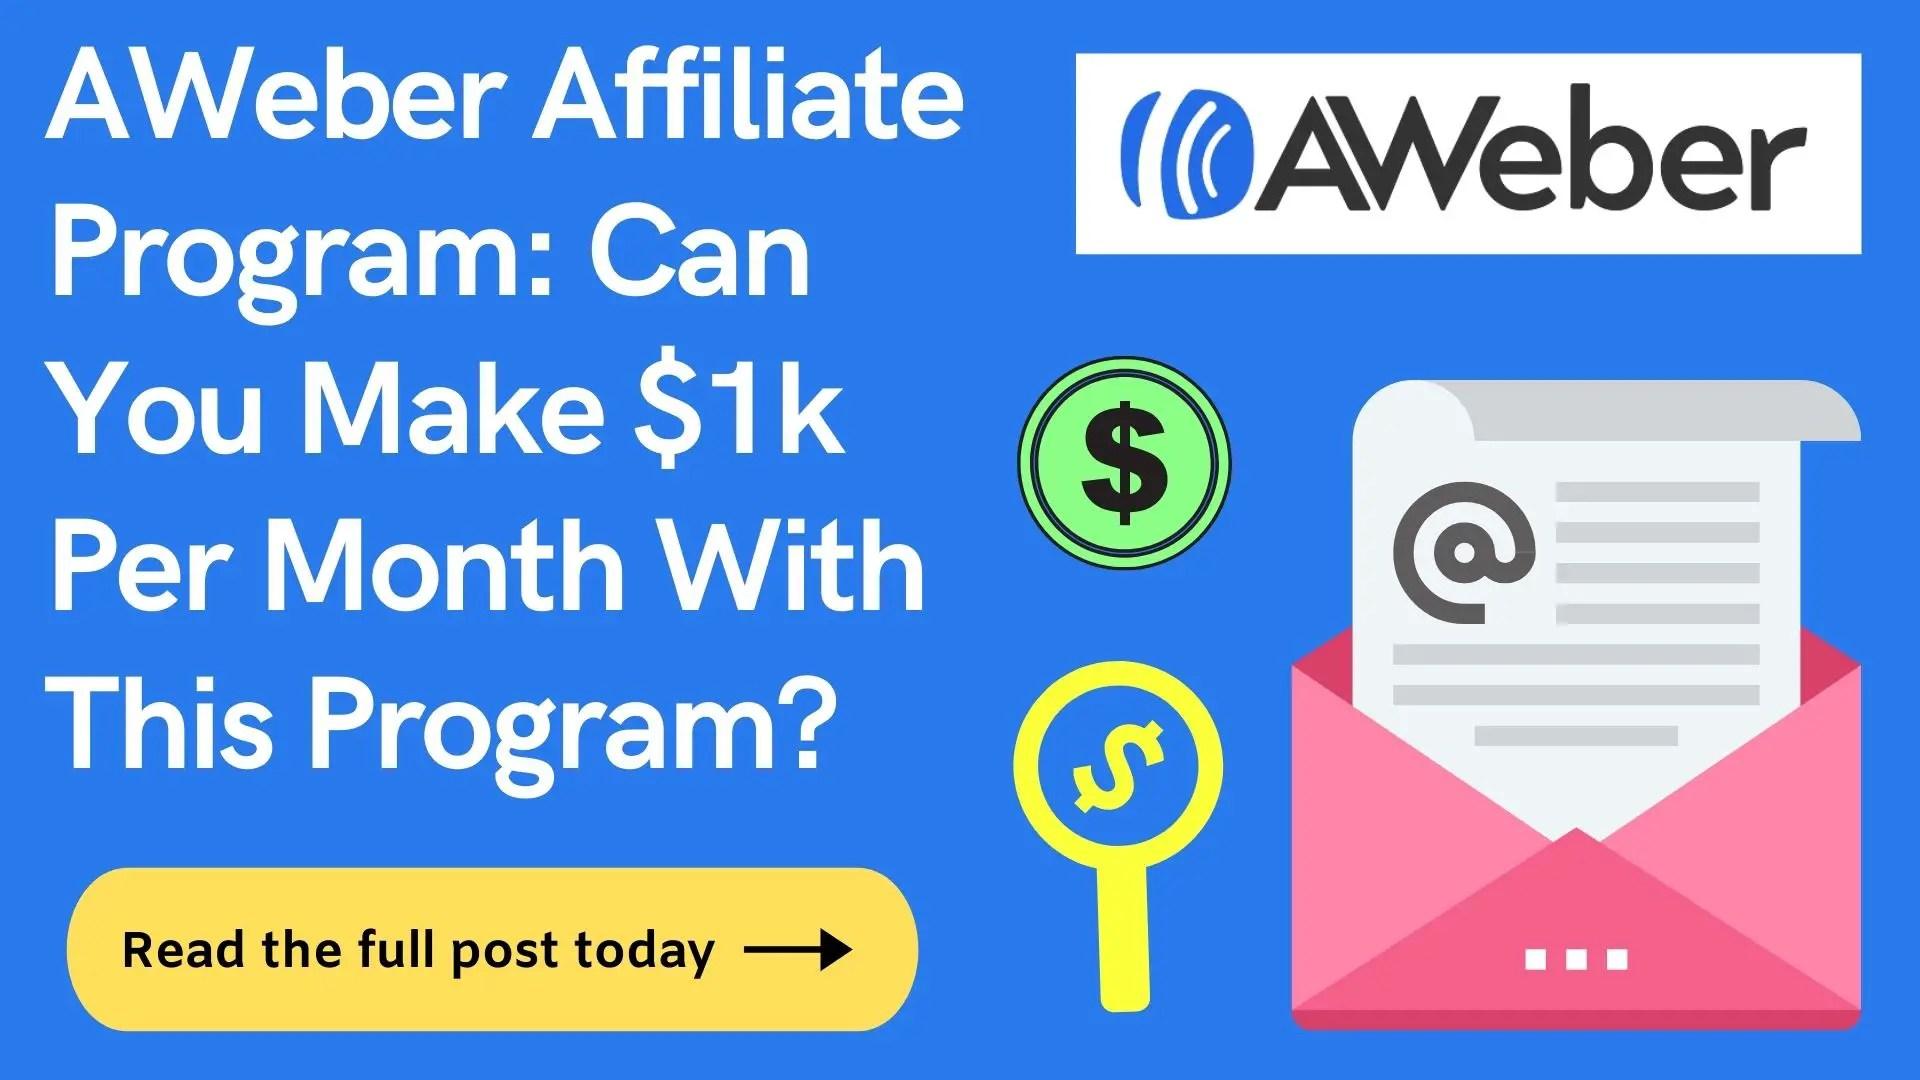 aweber affiliate review